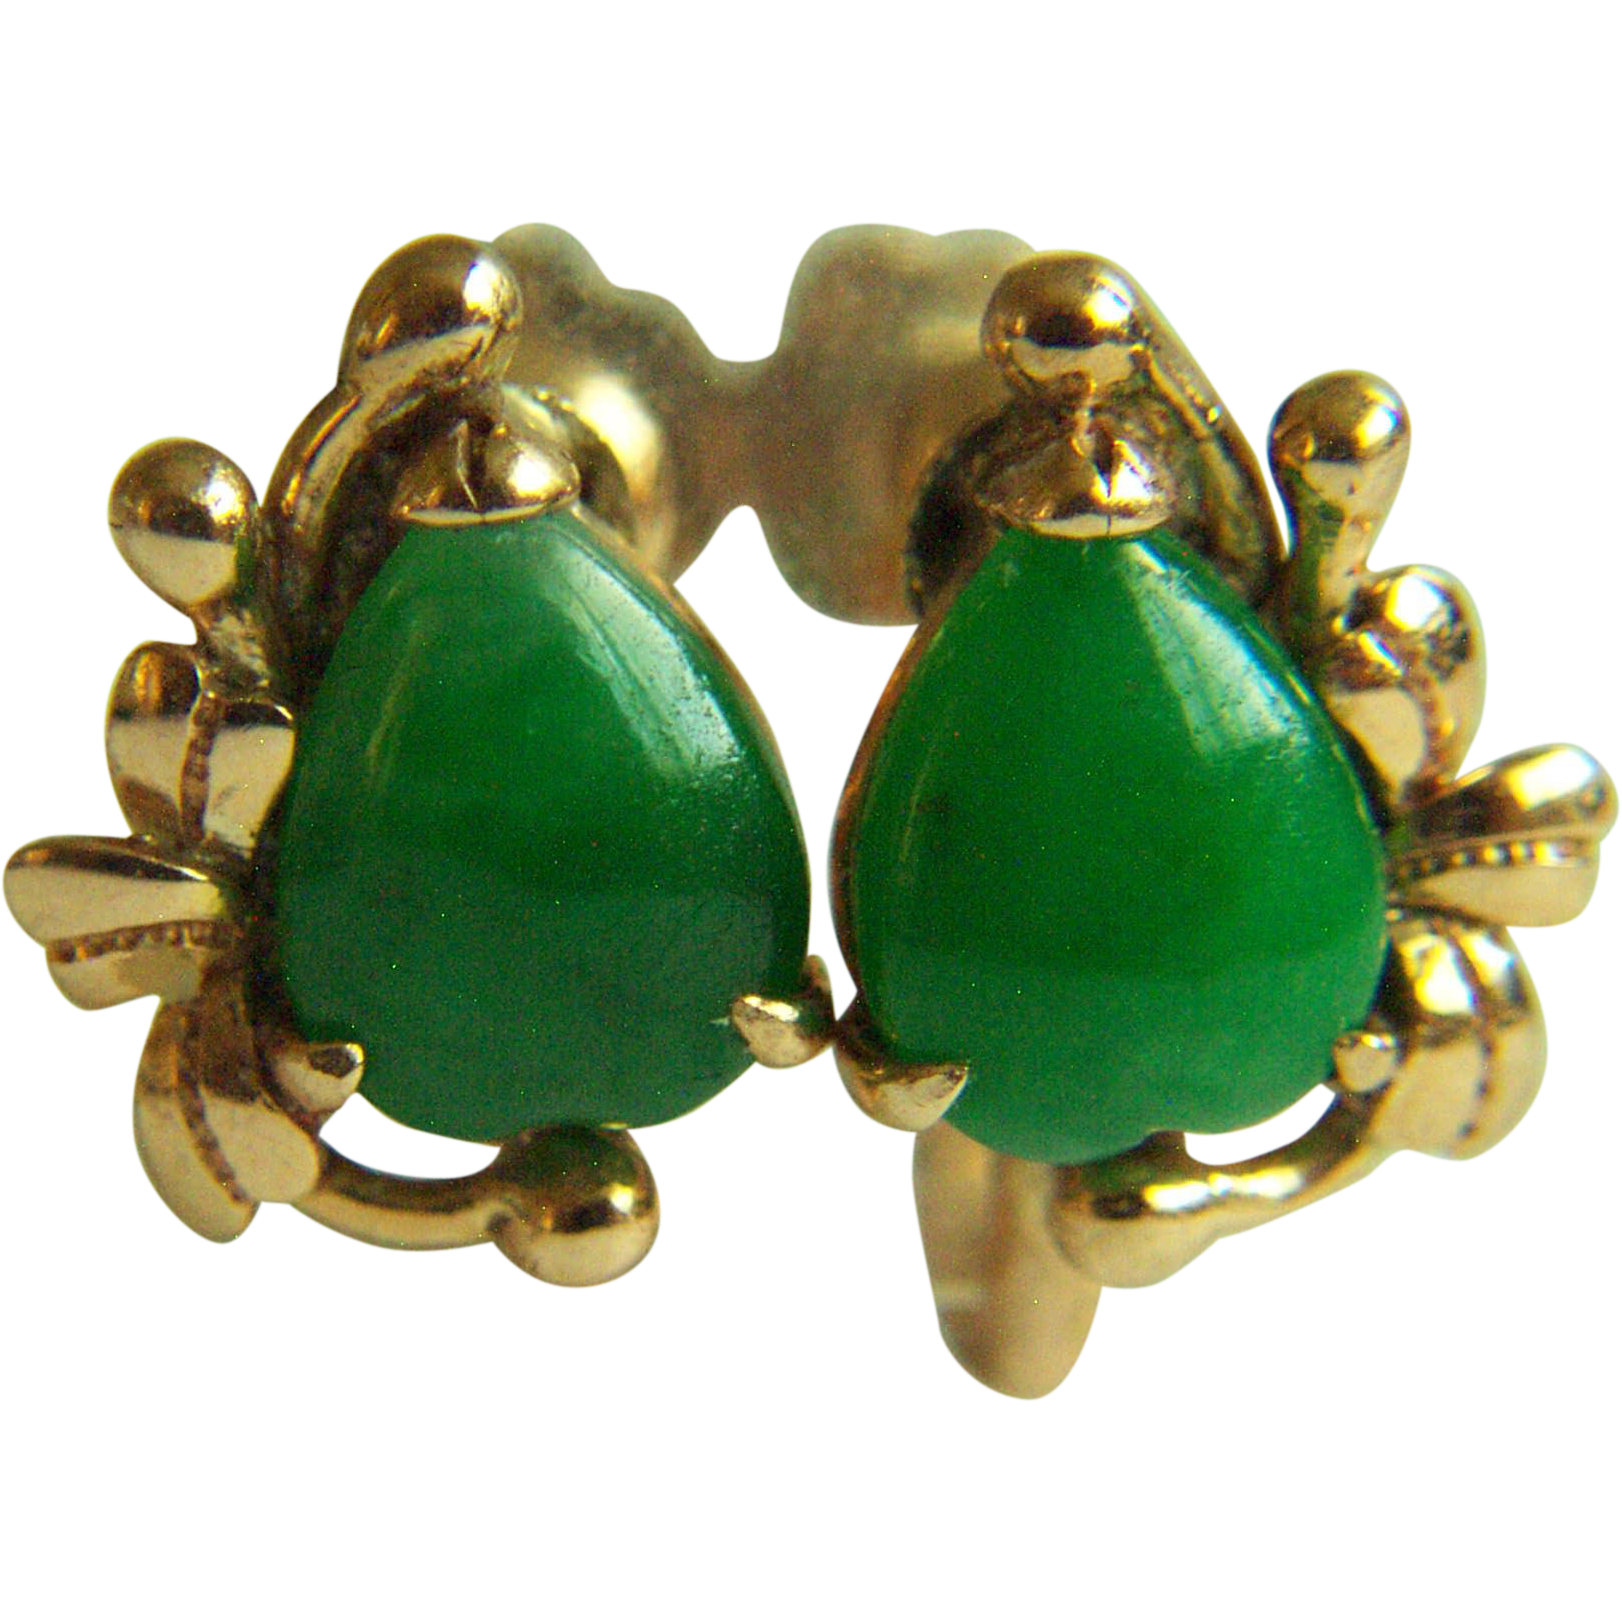 Extra Fine Vintage Tyl 14k Imperial Green Jadeite Jade